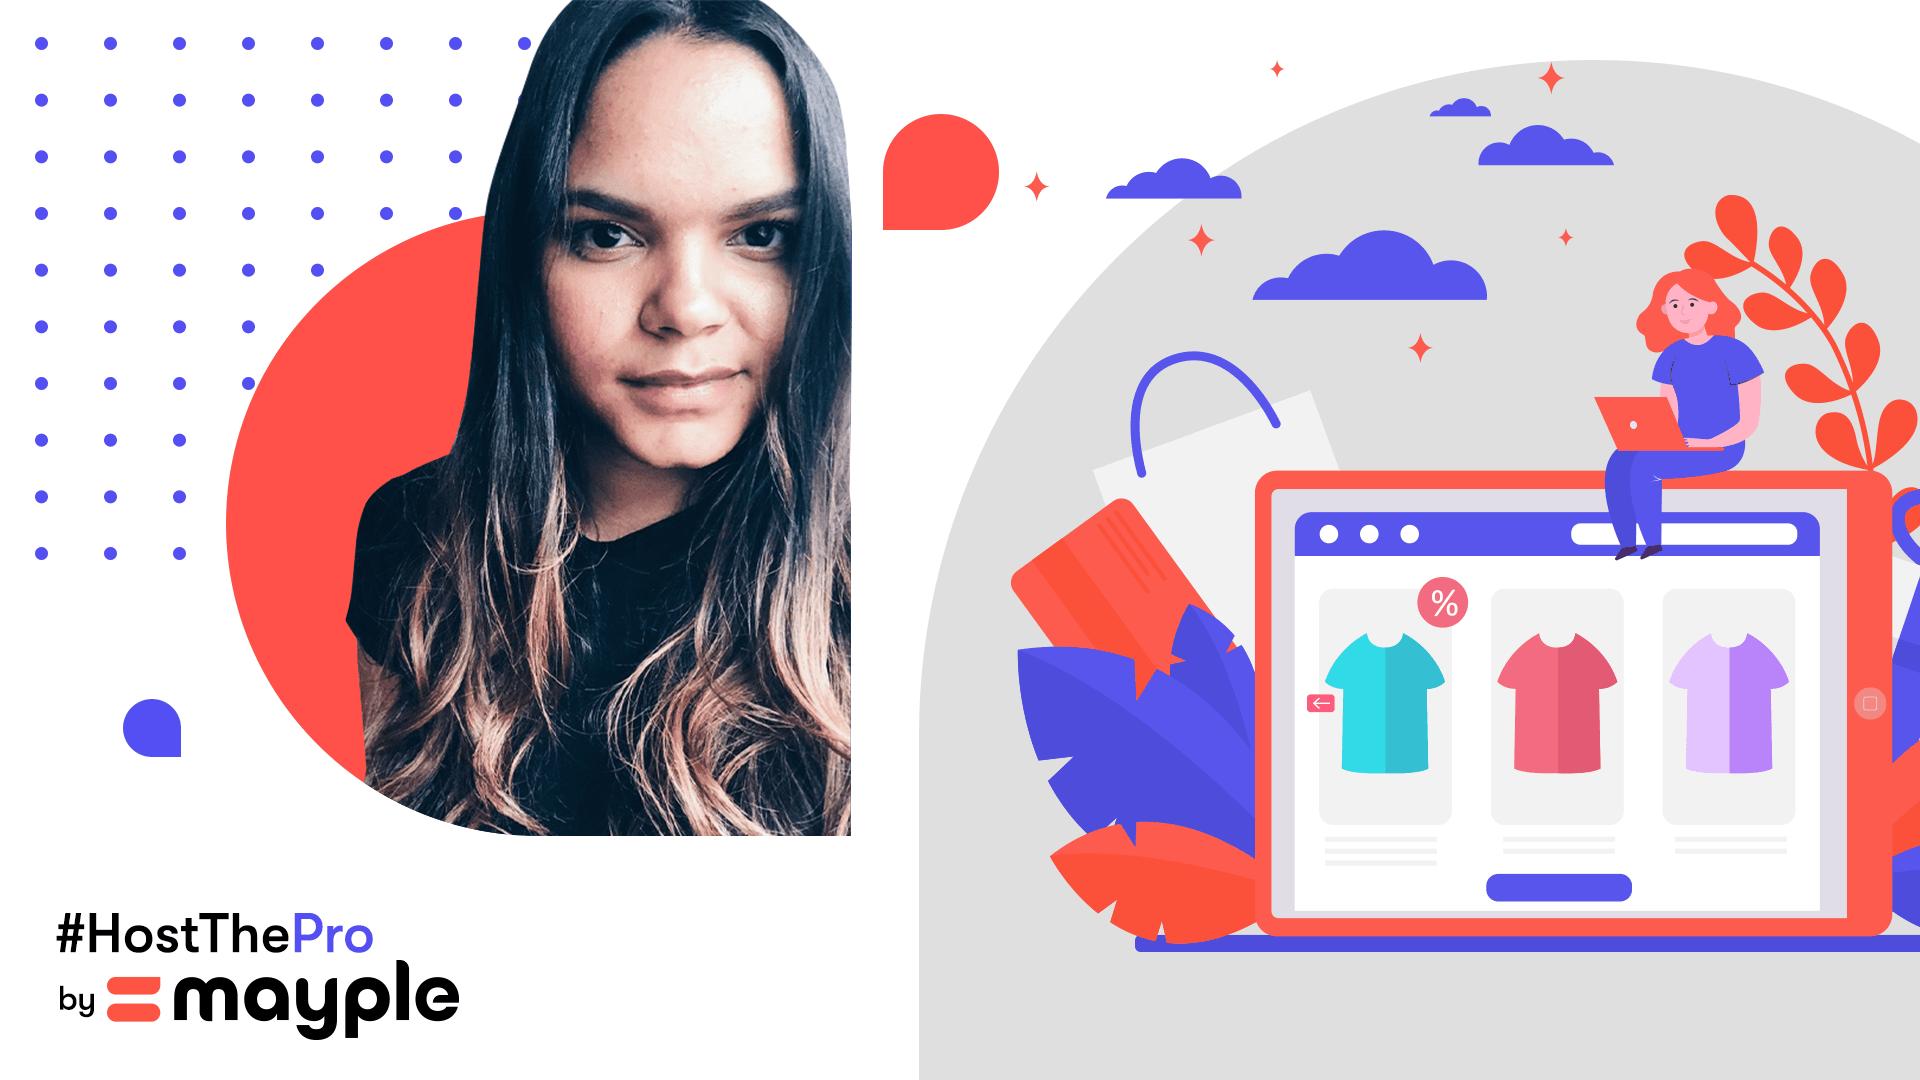 dhariana lozano social media for ecommerce interview